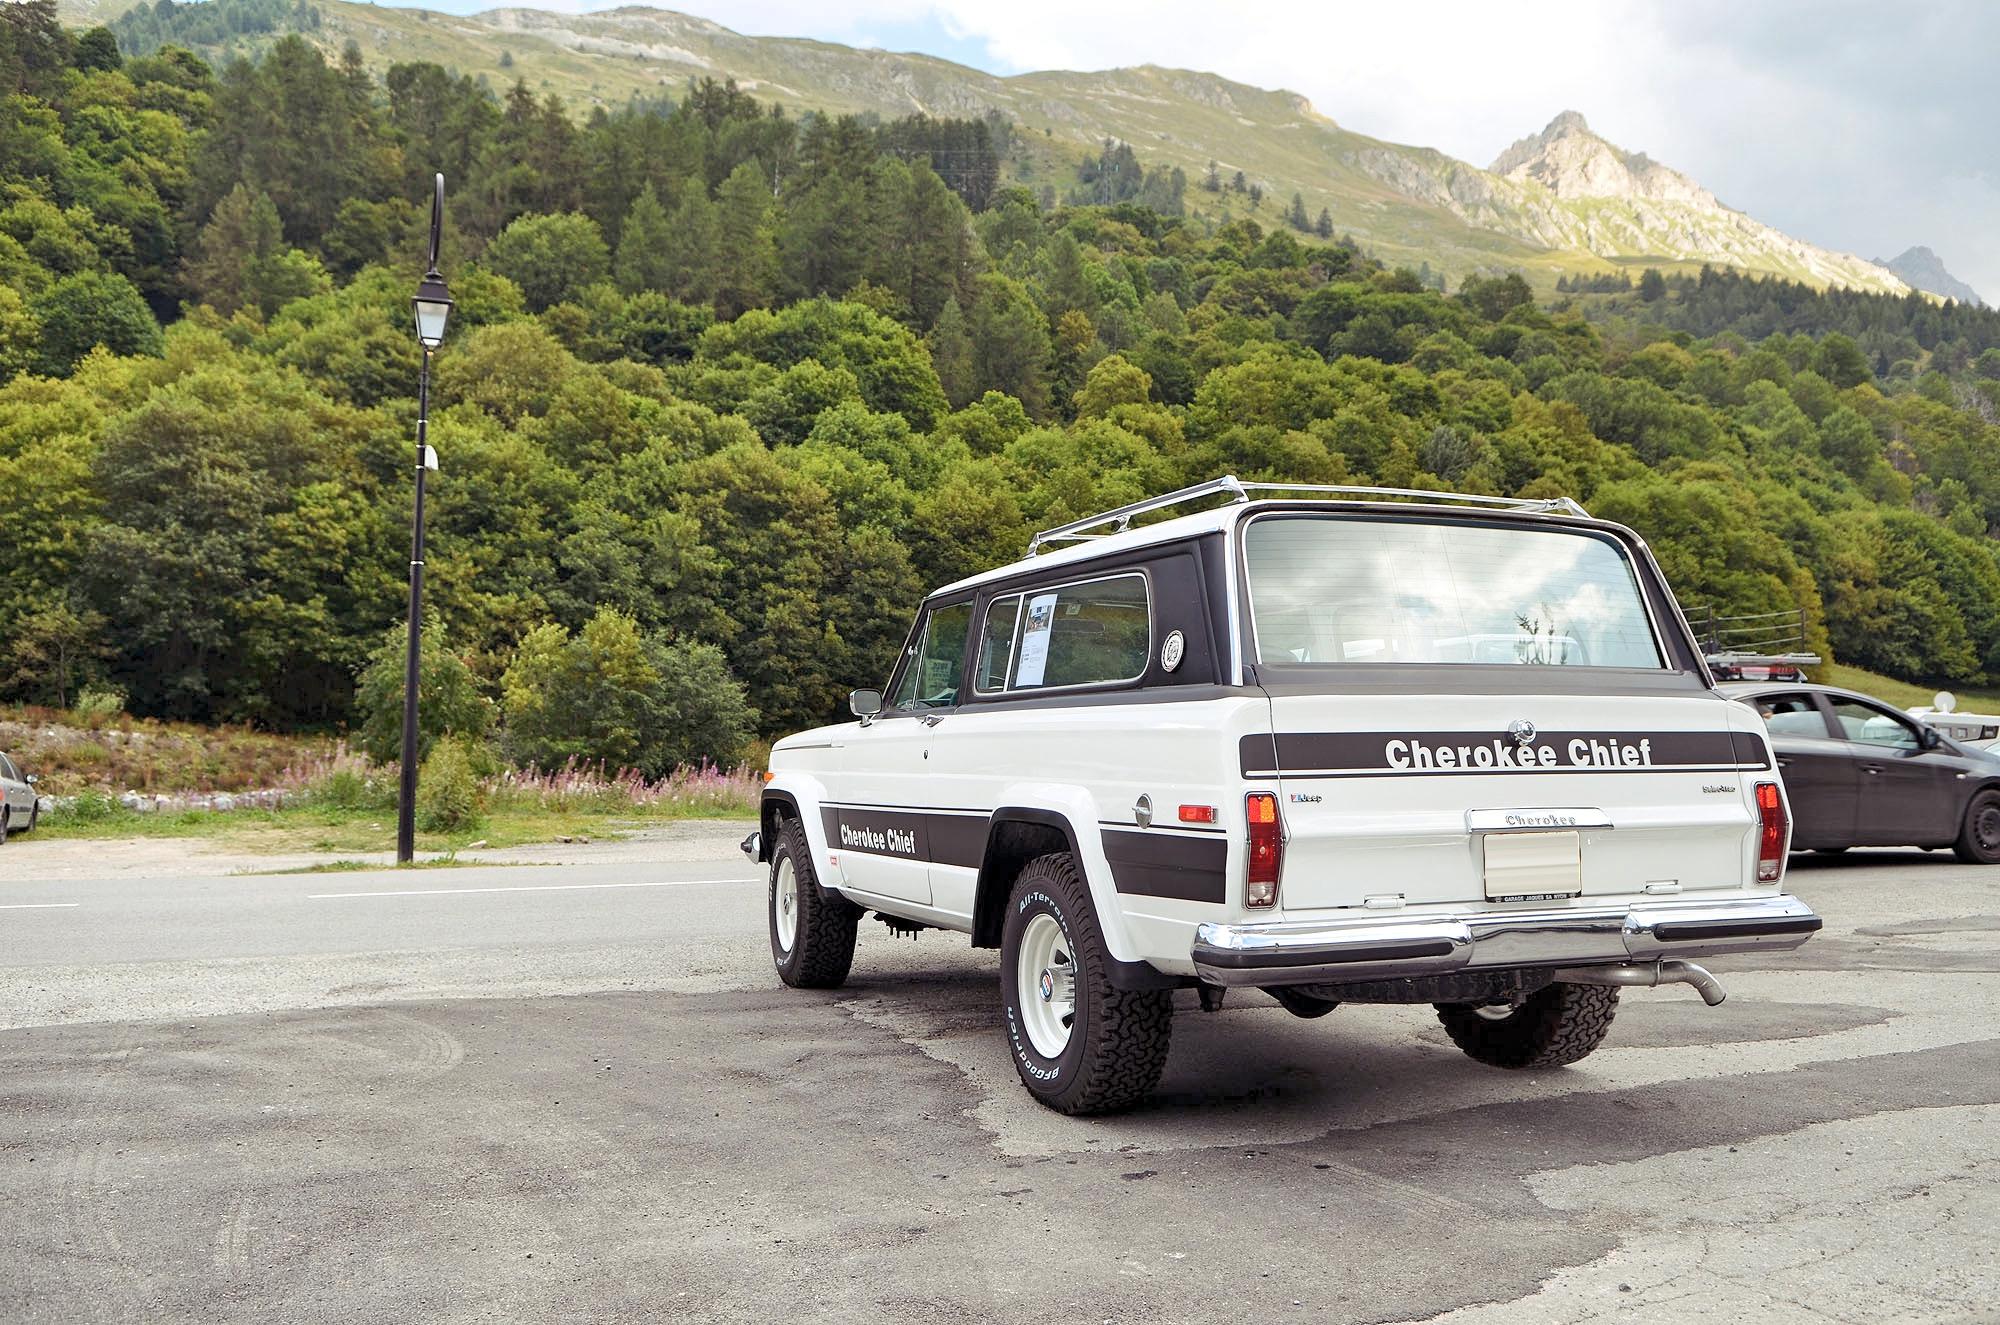 jeep-cherokee-chief-valloire-055.JPG